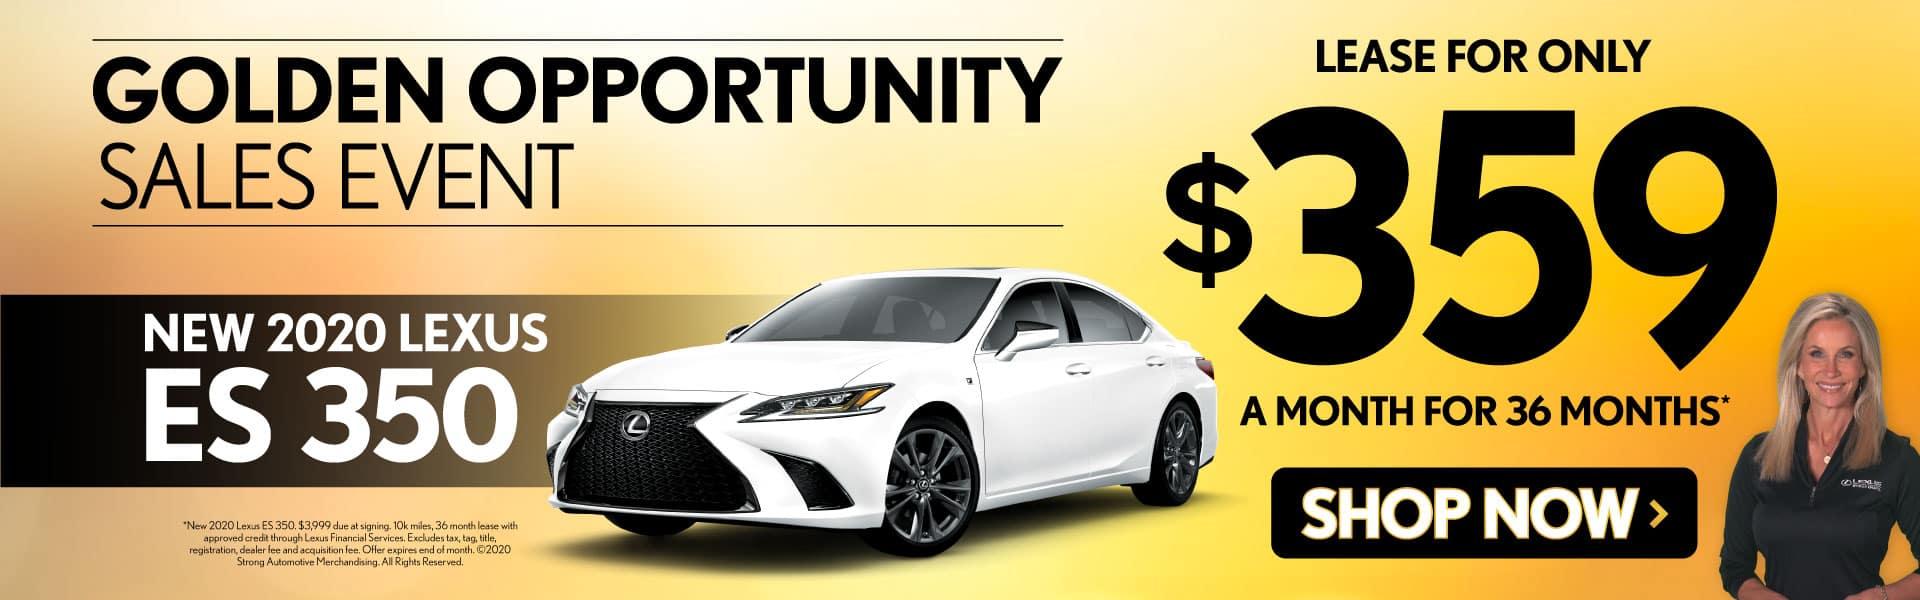 New 2020 Lexus ES 350 only $359/mo - Shop Now